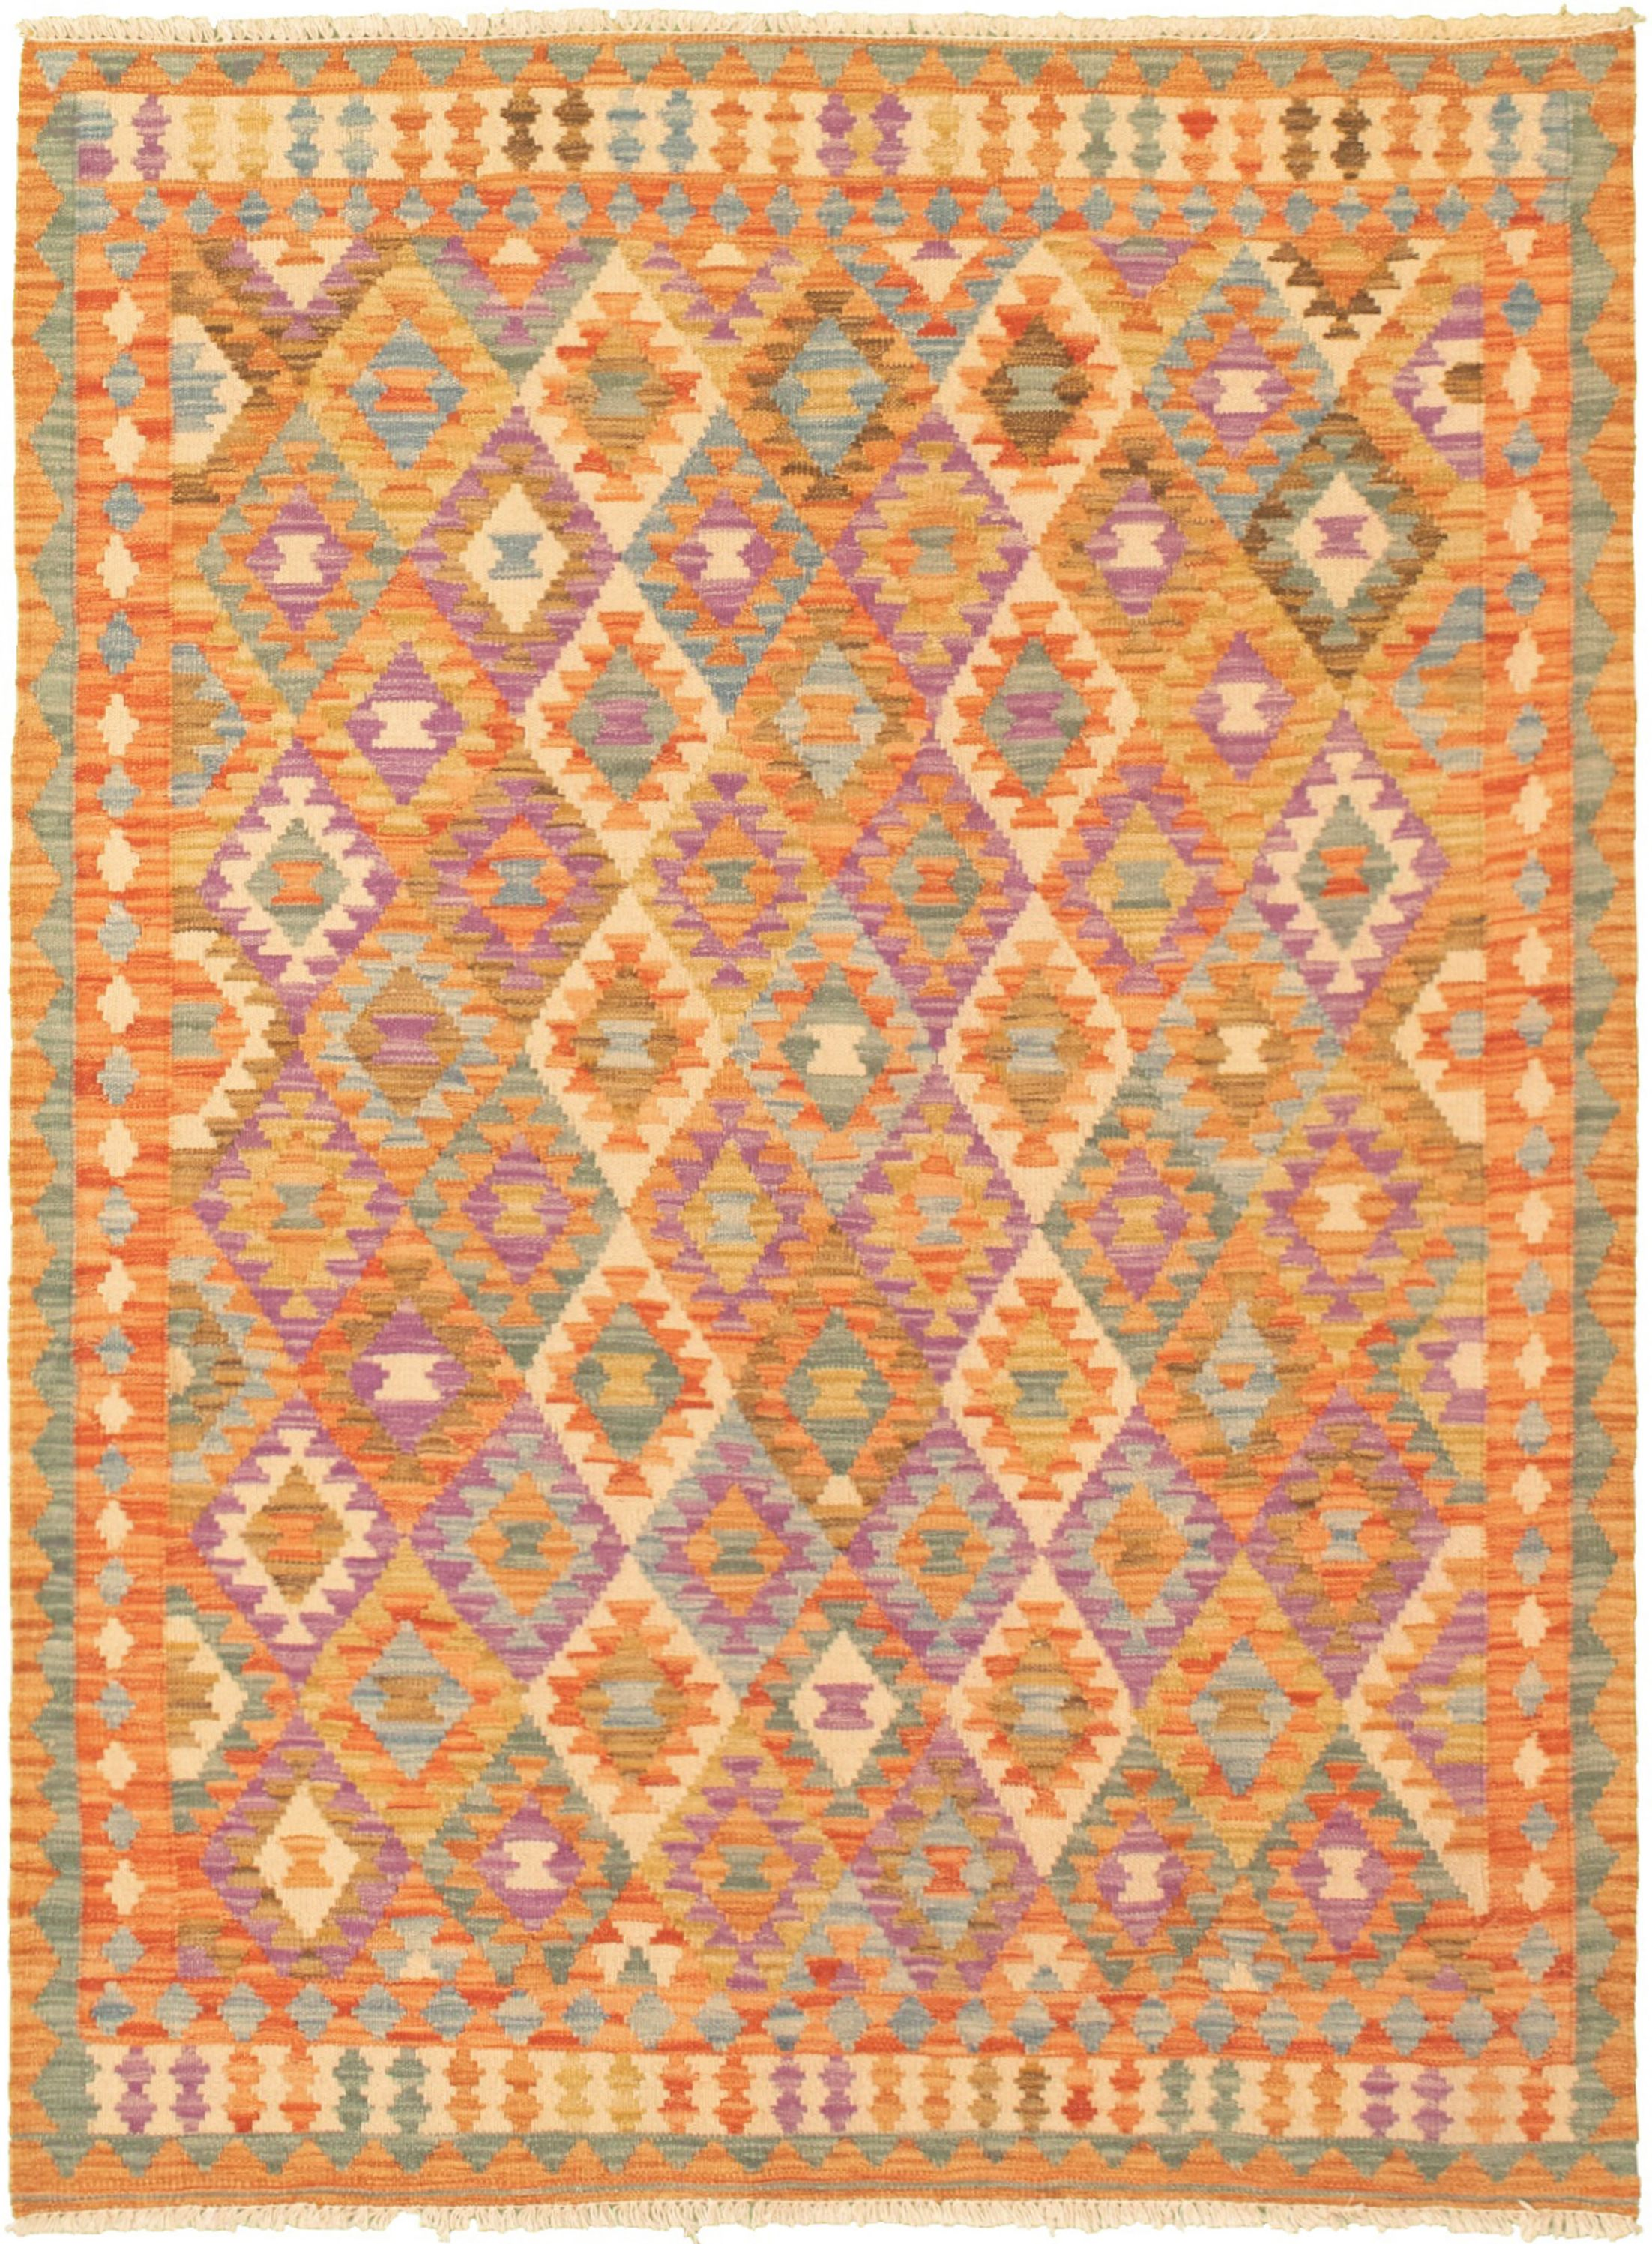 "Hand woven Bold and Colorful  Orange  Kilim 4'2"" x 5'8"" Size: 4'2"" x 5'8"""